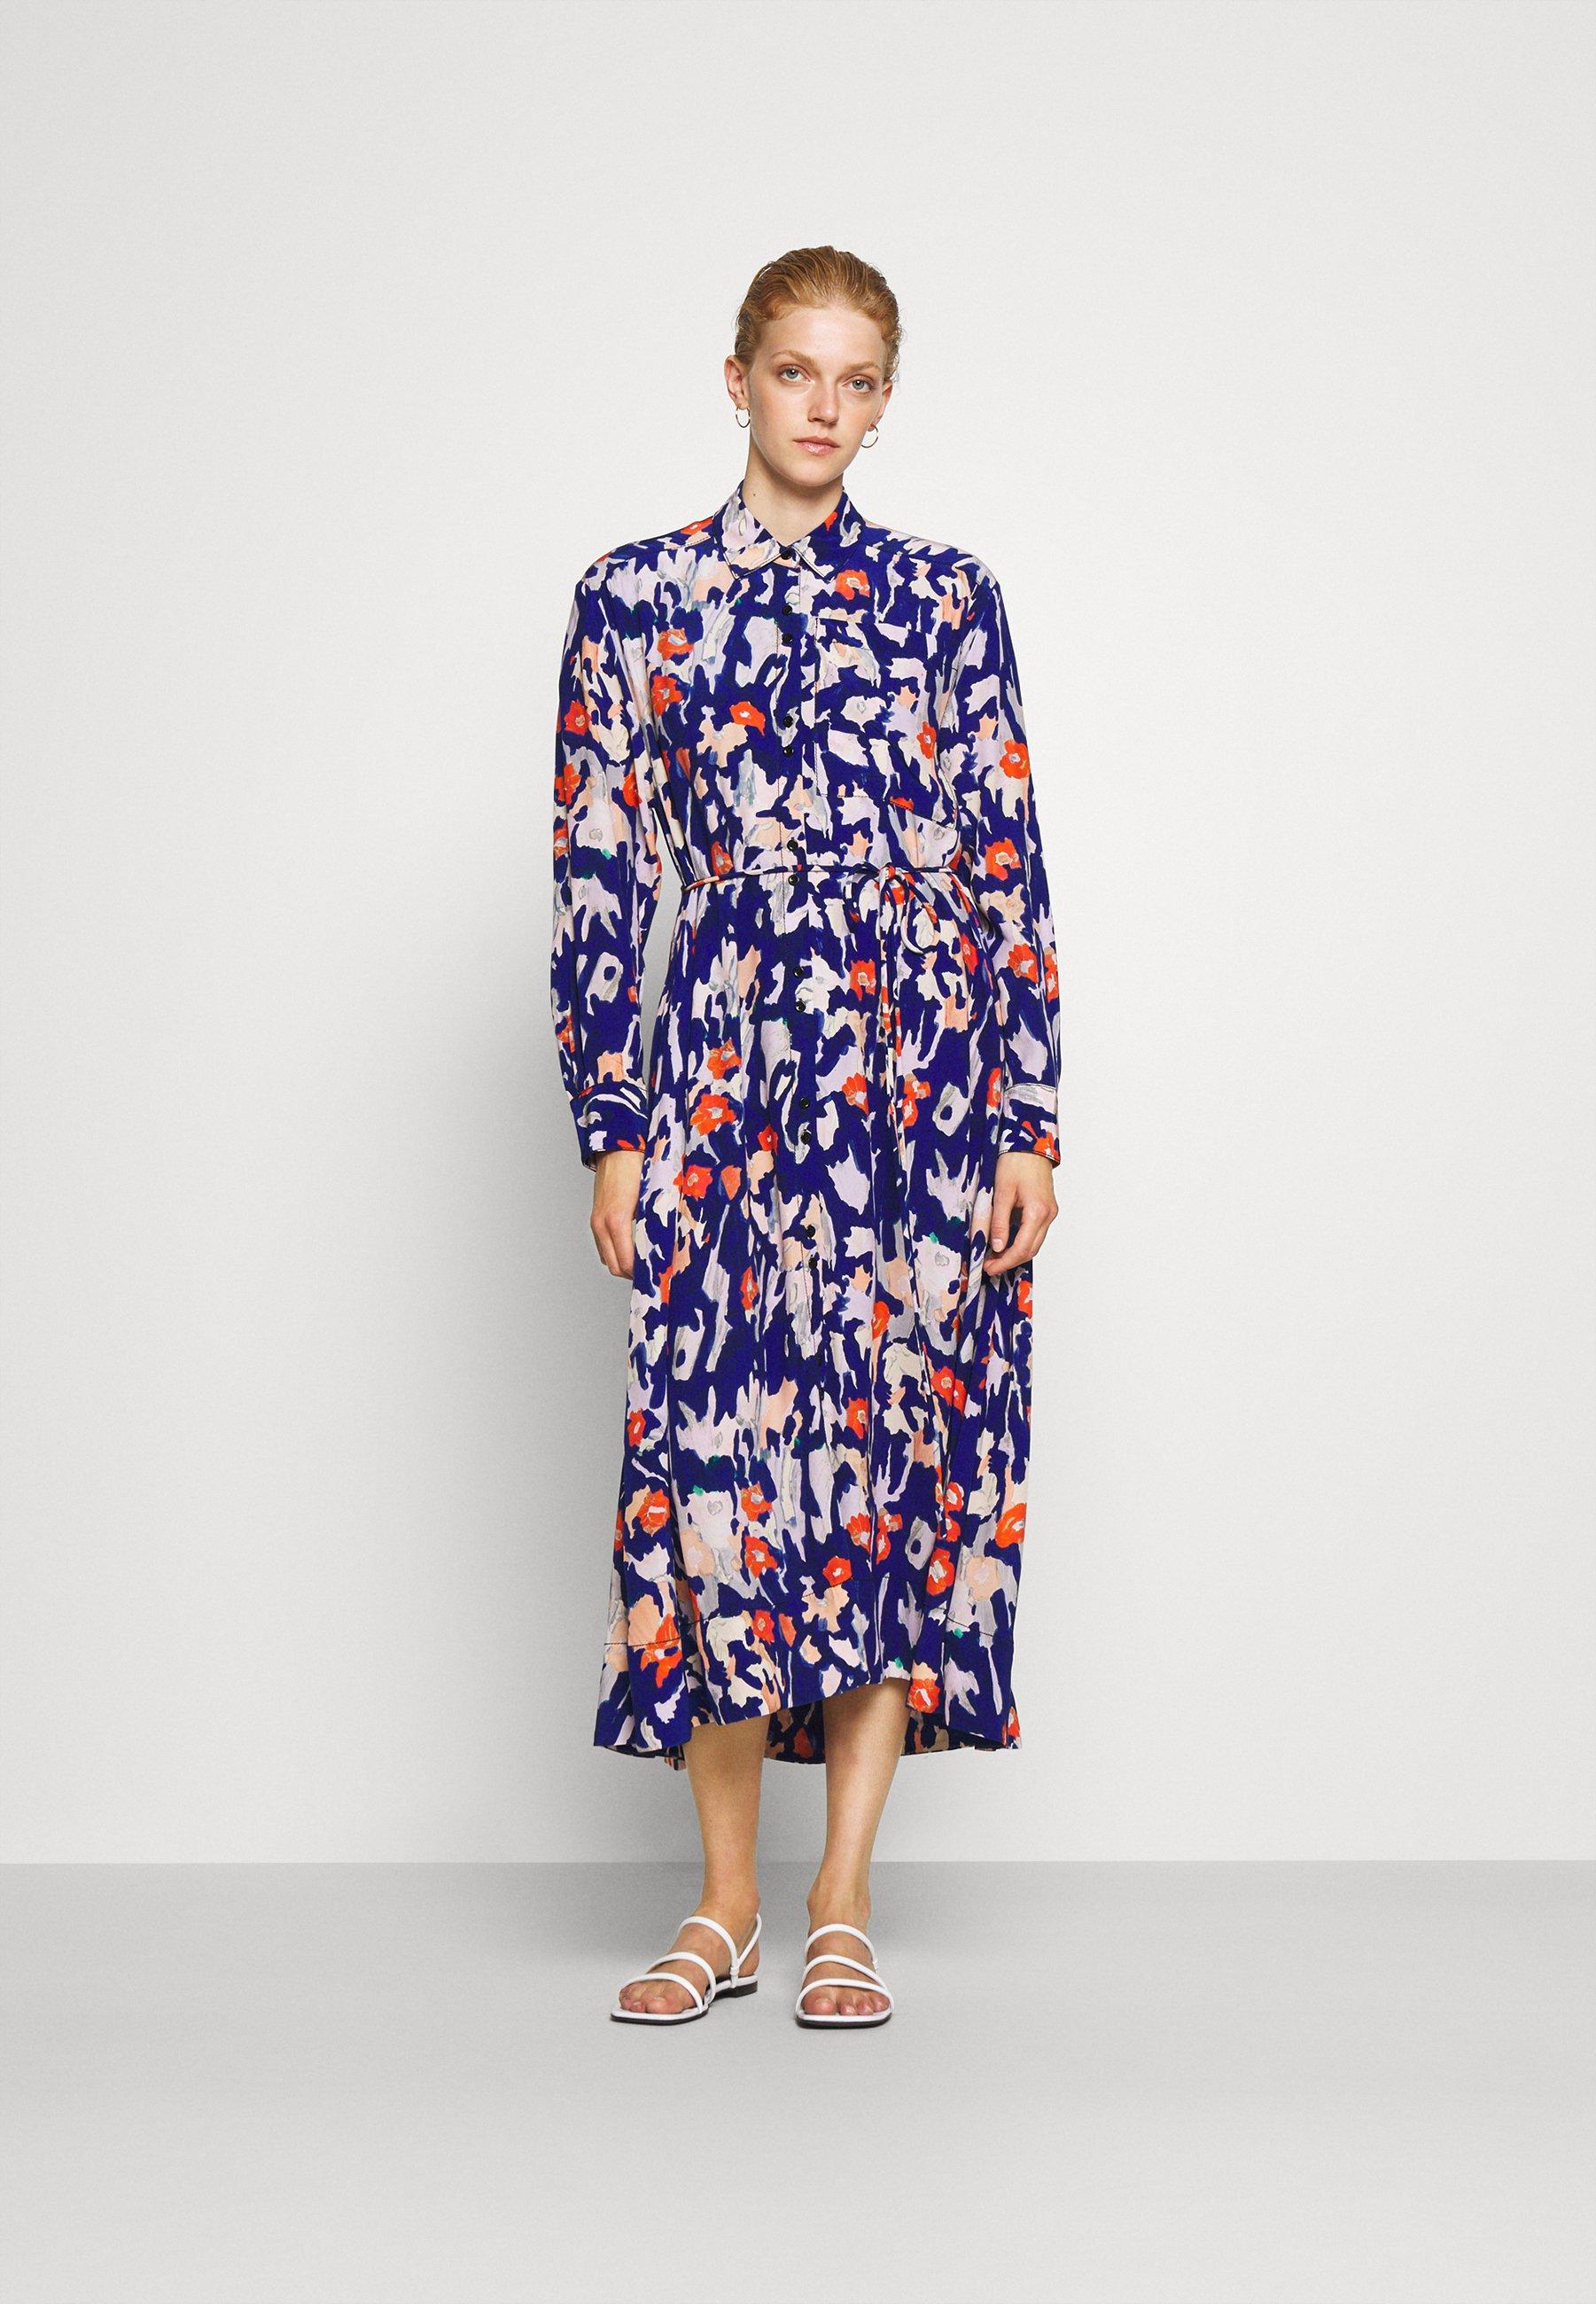 Damen PAINTED FLORAL SHIRT DRESS - Blusenkleid